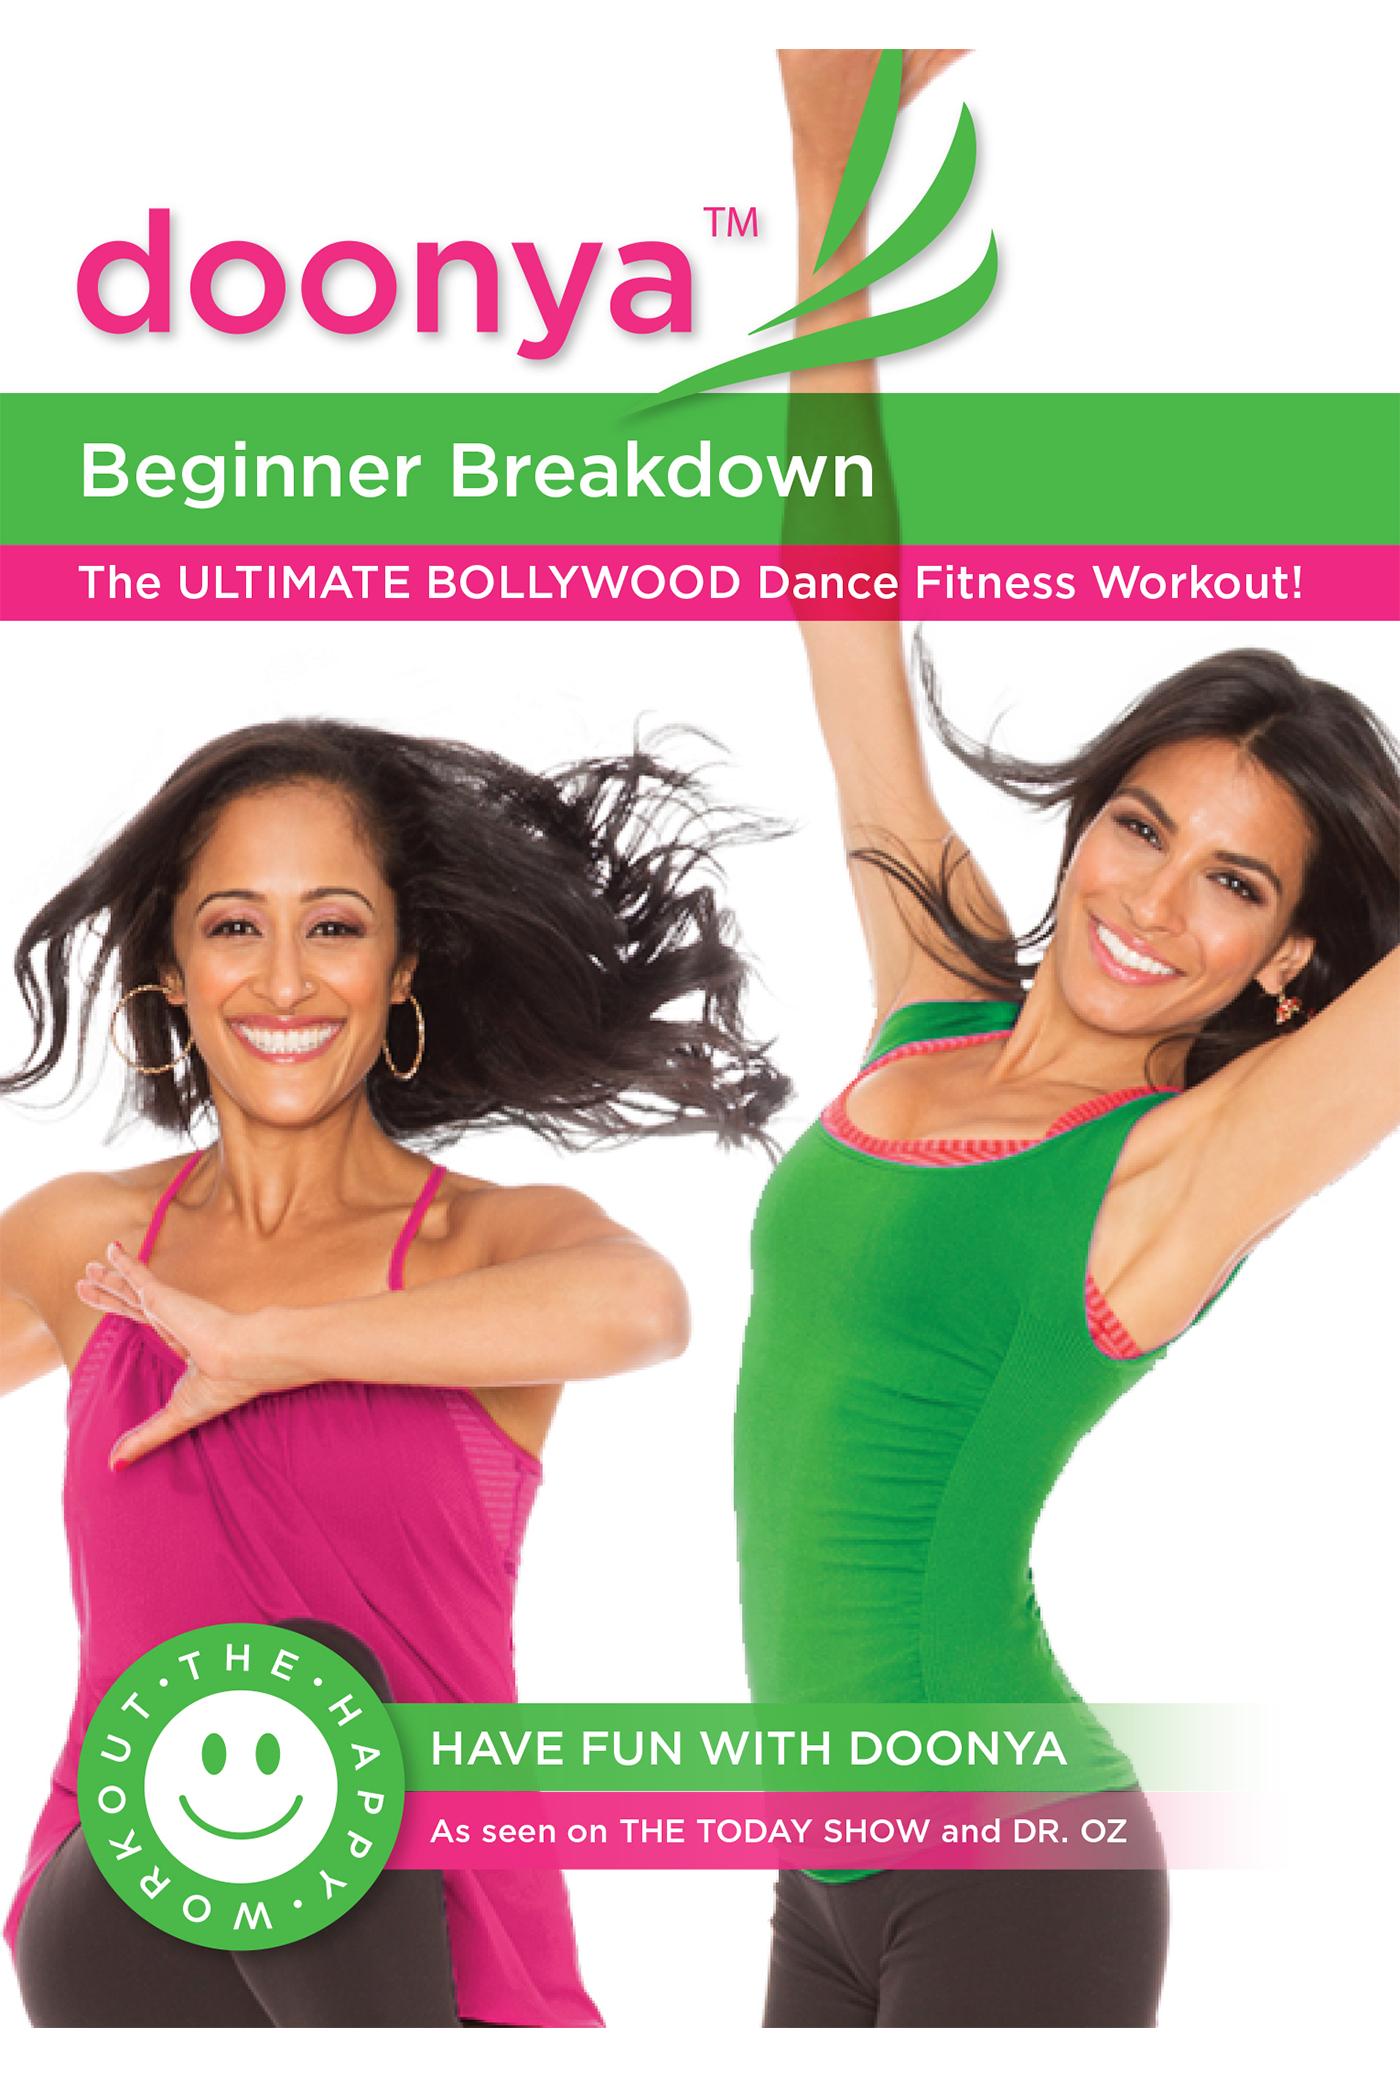 Doonya the Bollywood Dance Workout: Beginner Breakdown